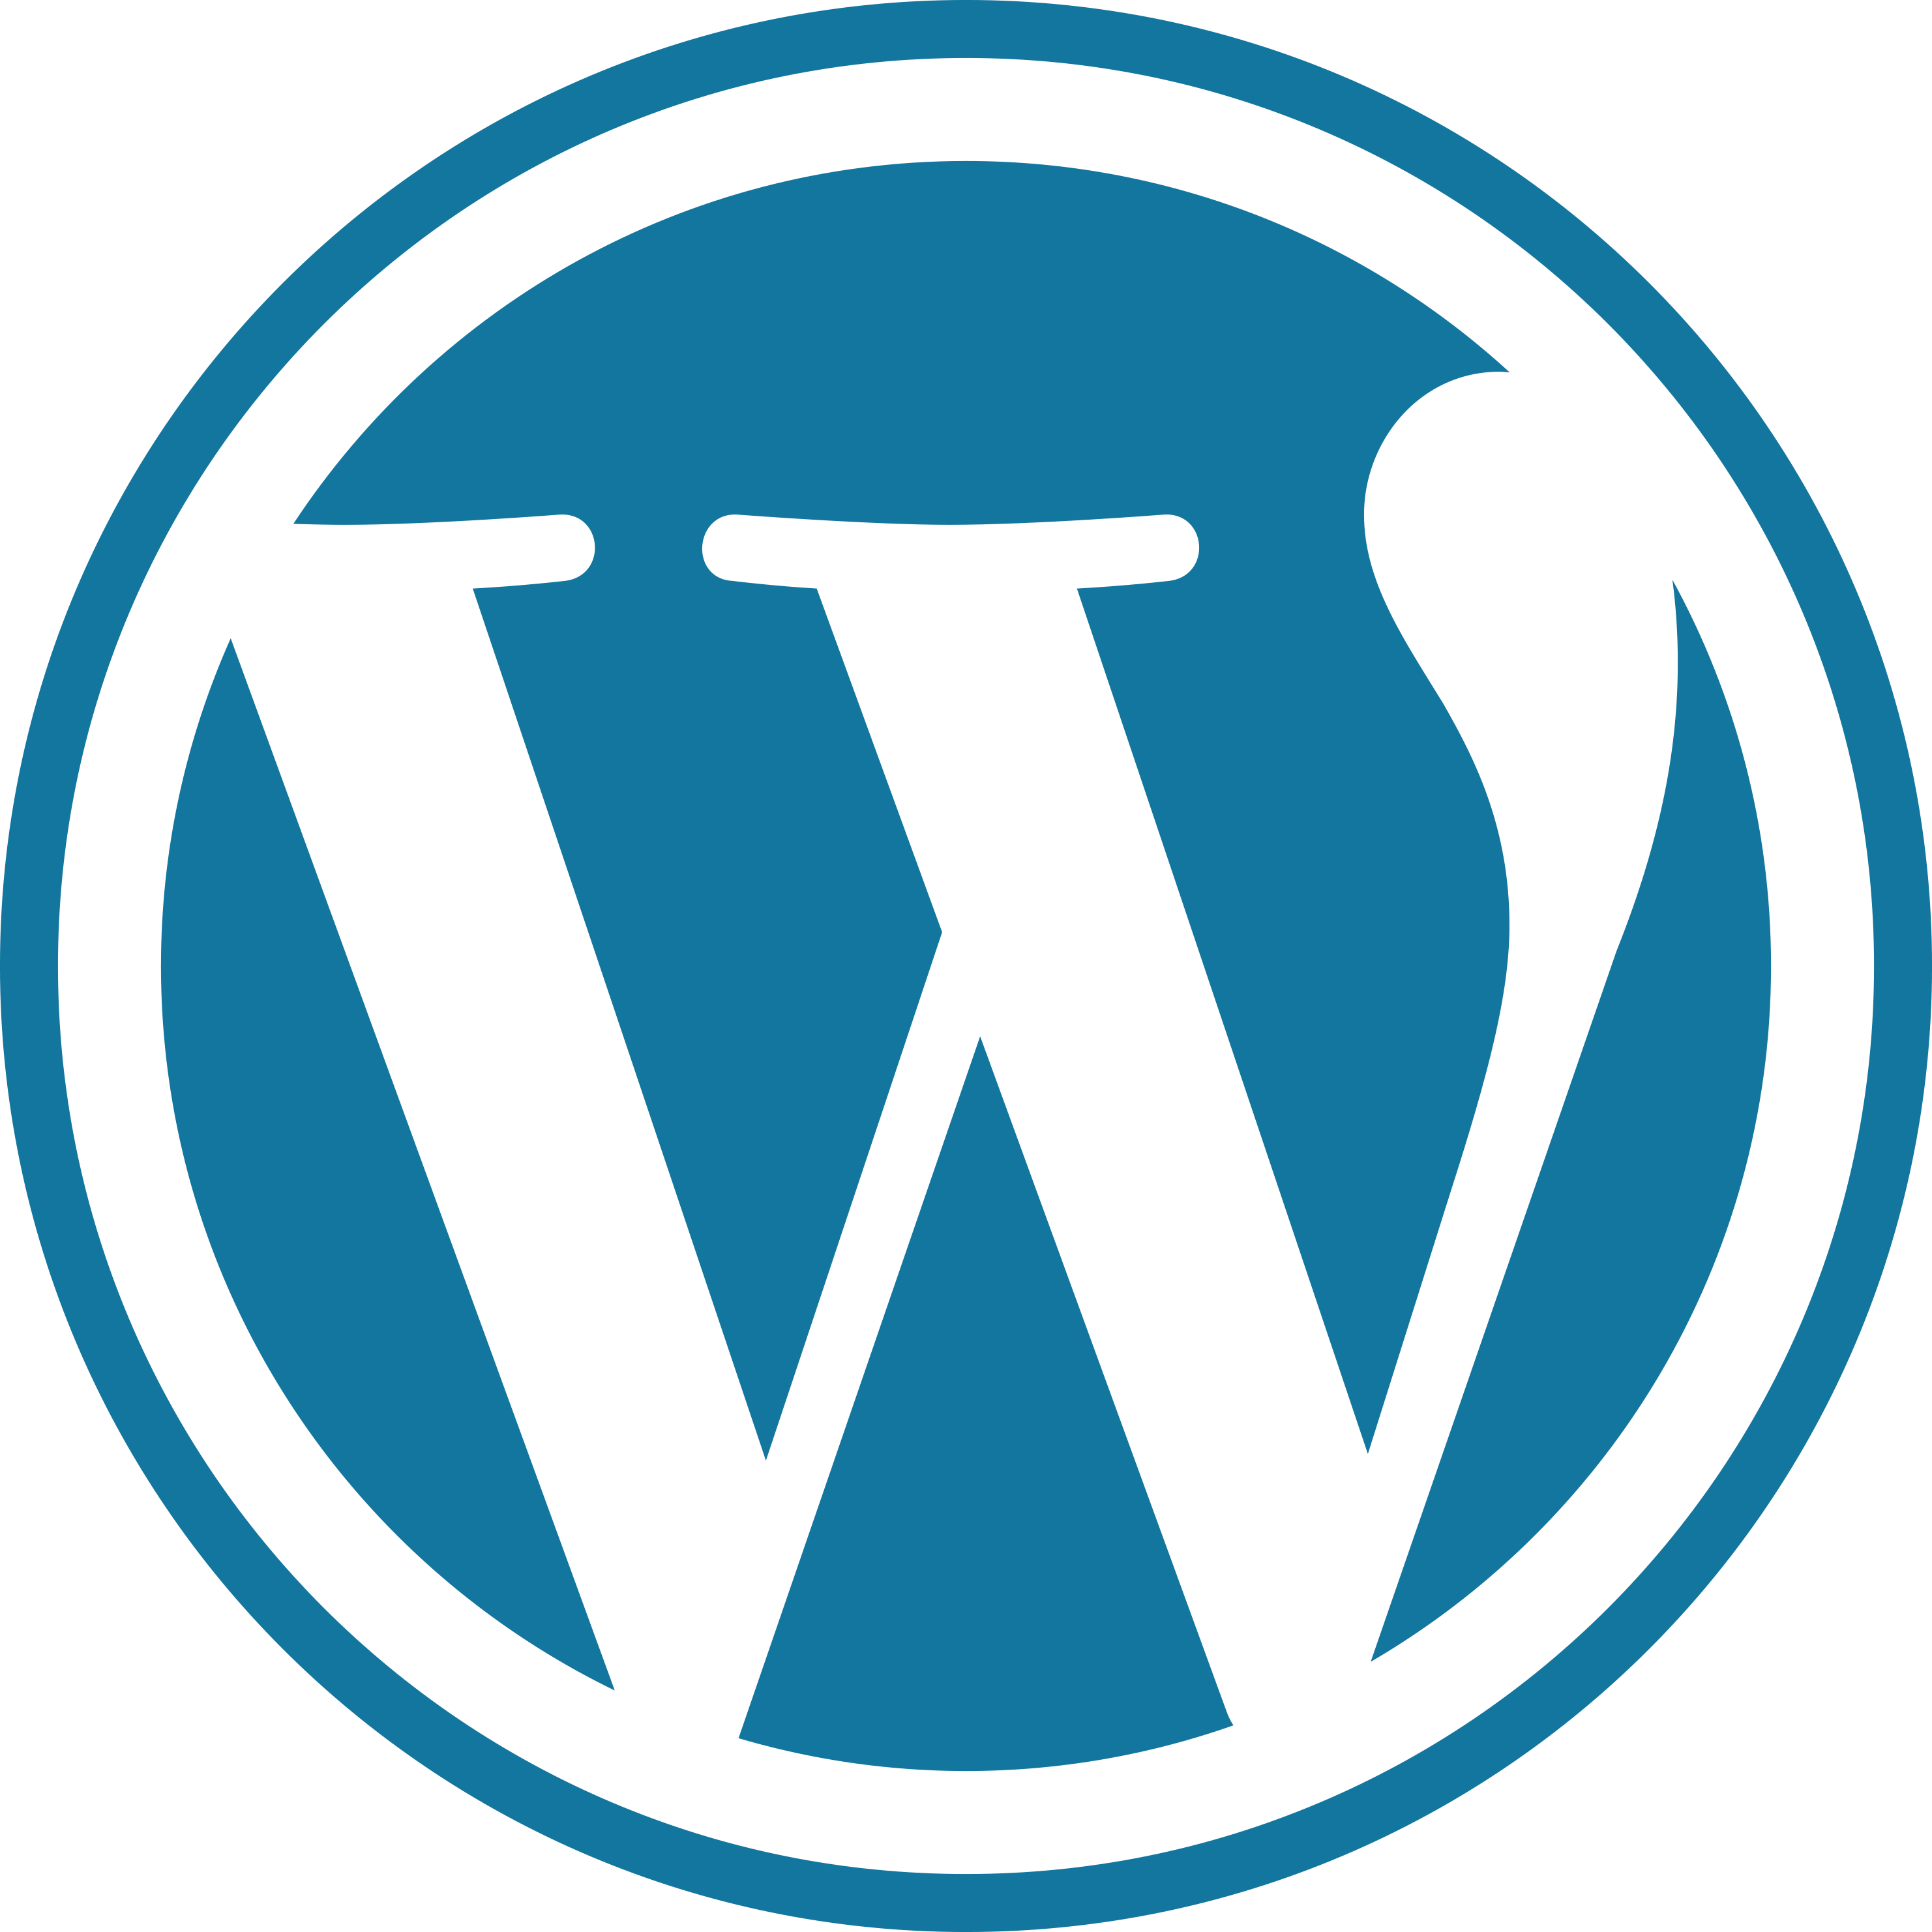 2020 - WordPress - W Mark (blue)